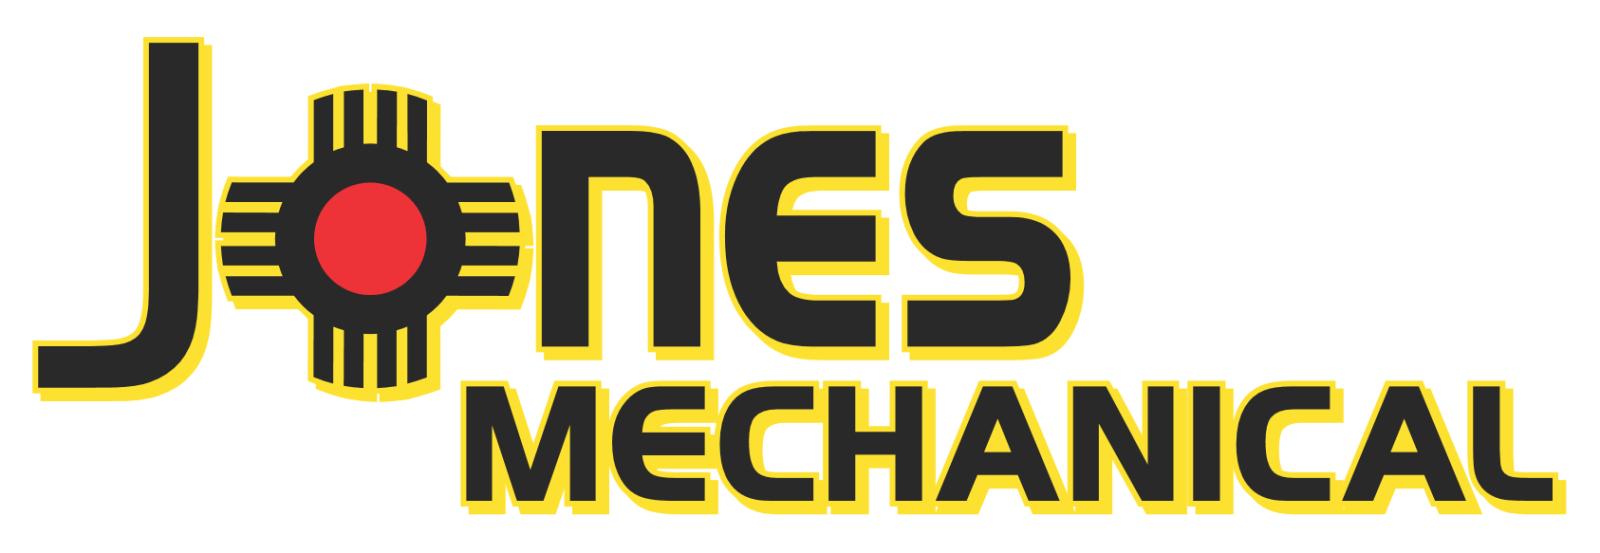 Jones Mechanical logo